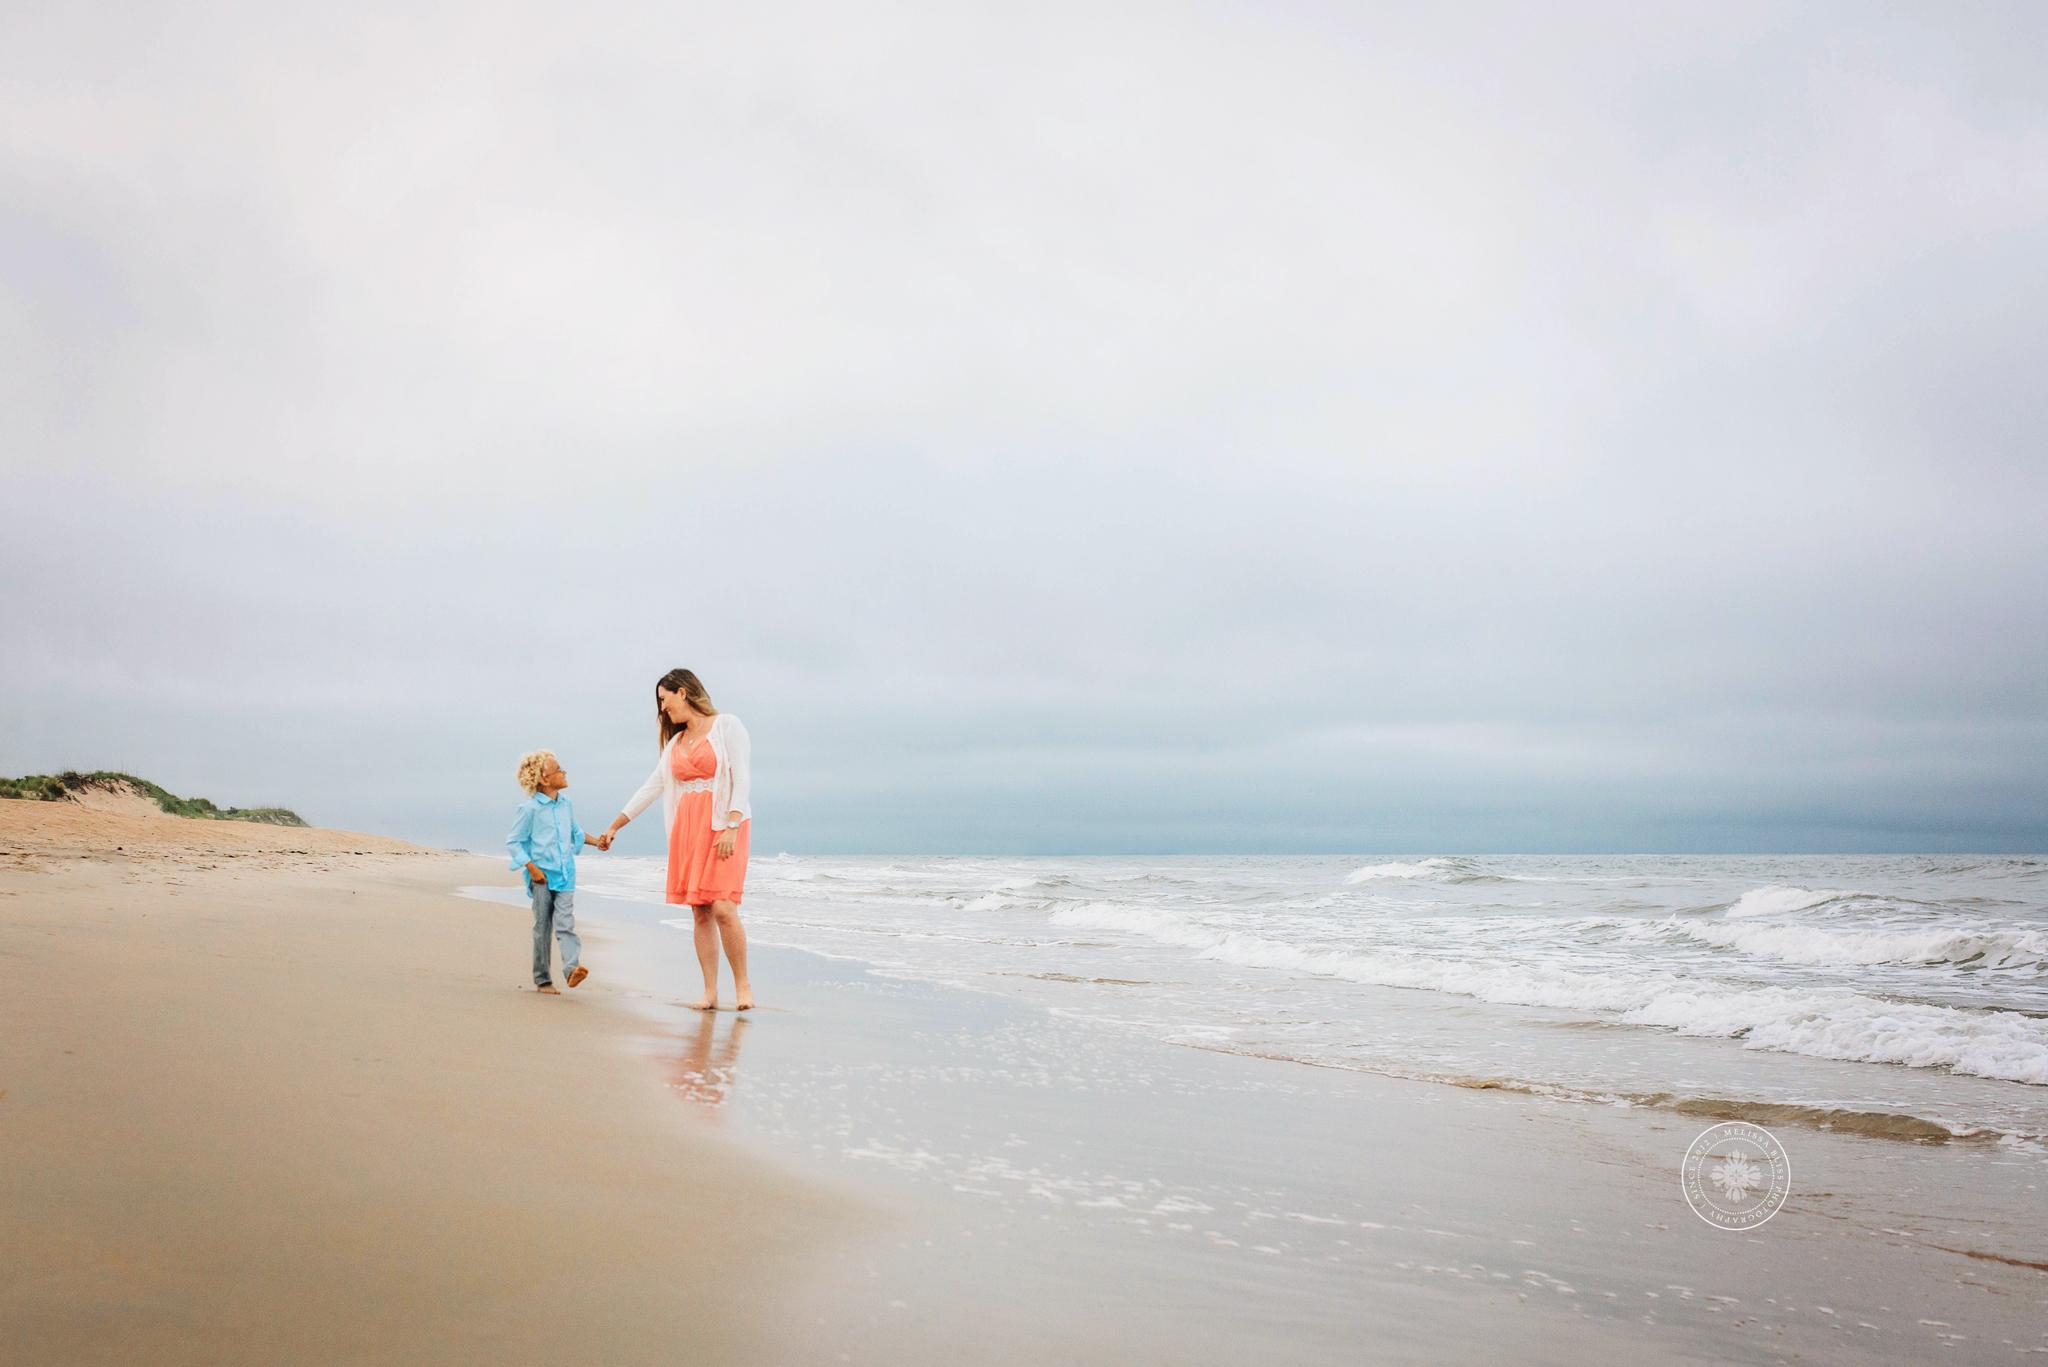 virginia-beach-family-beach-session-melissa-bliss-photography-sandbridge-norfolk-chesapeake-photographers.jpg